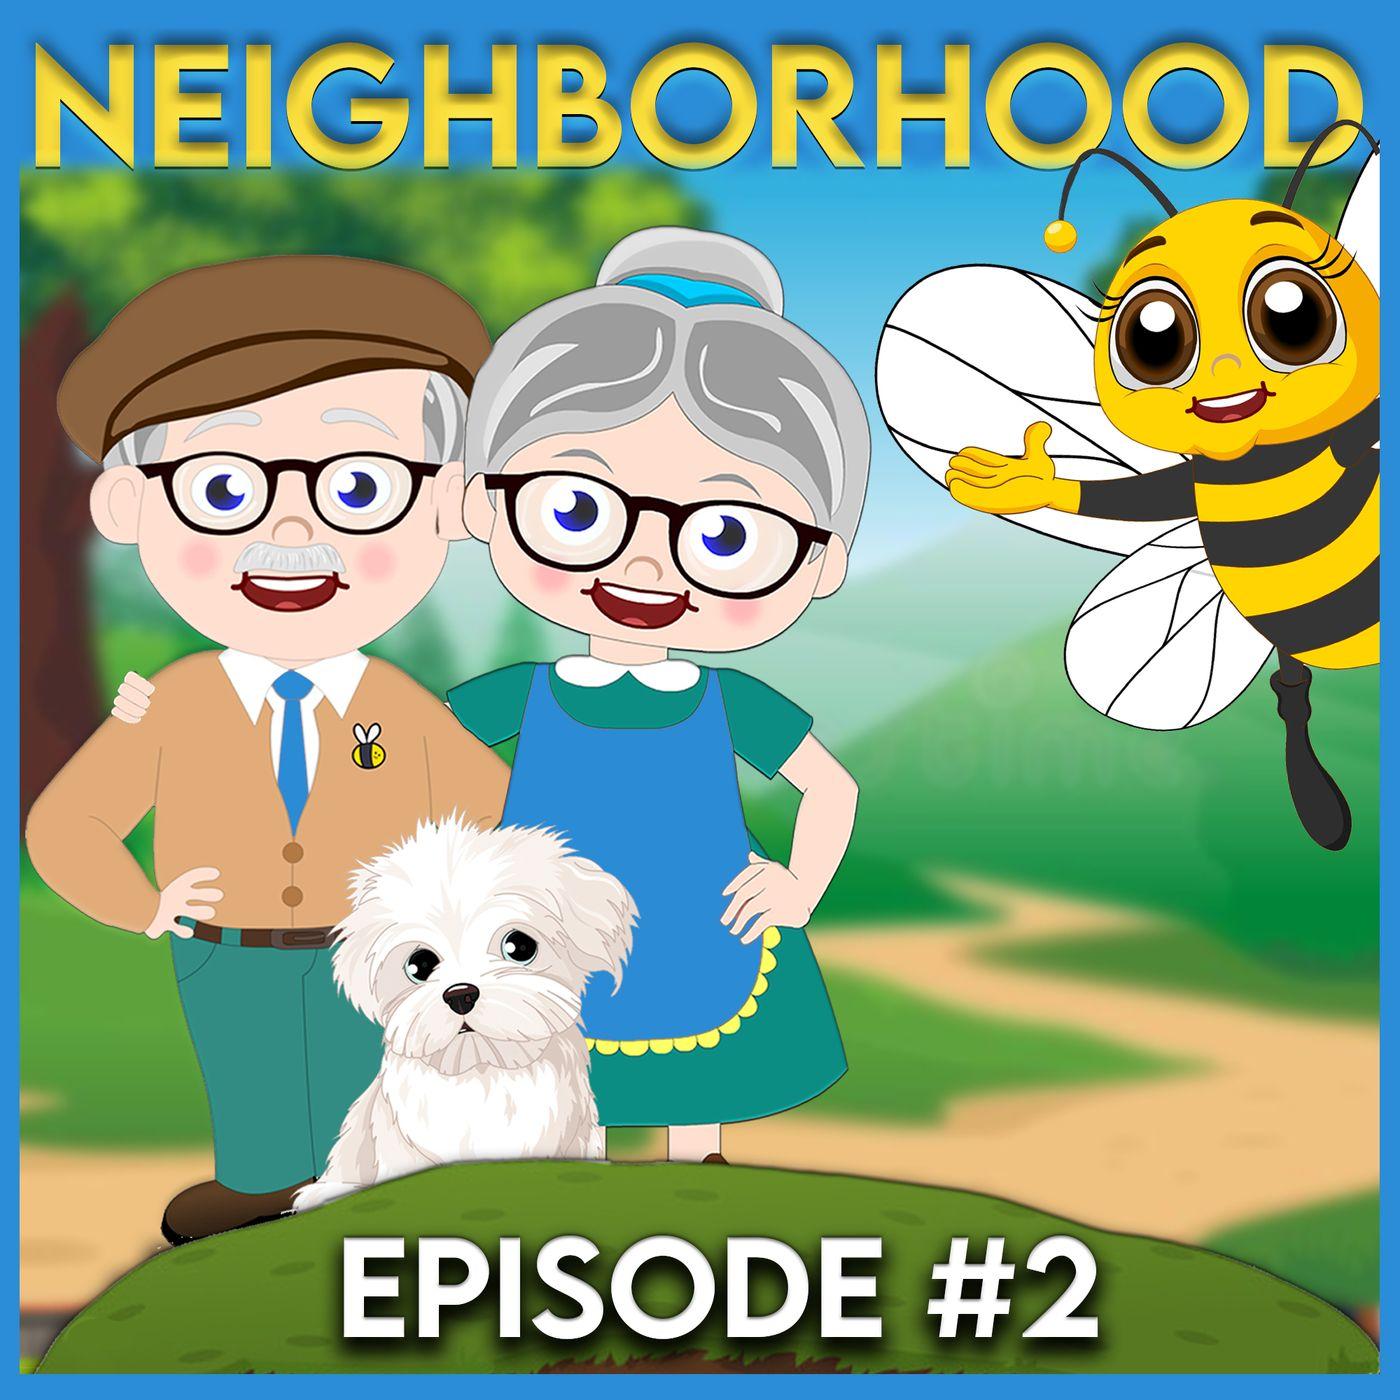 Mrs. Honeybee's Neighborhood - Episode 2